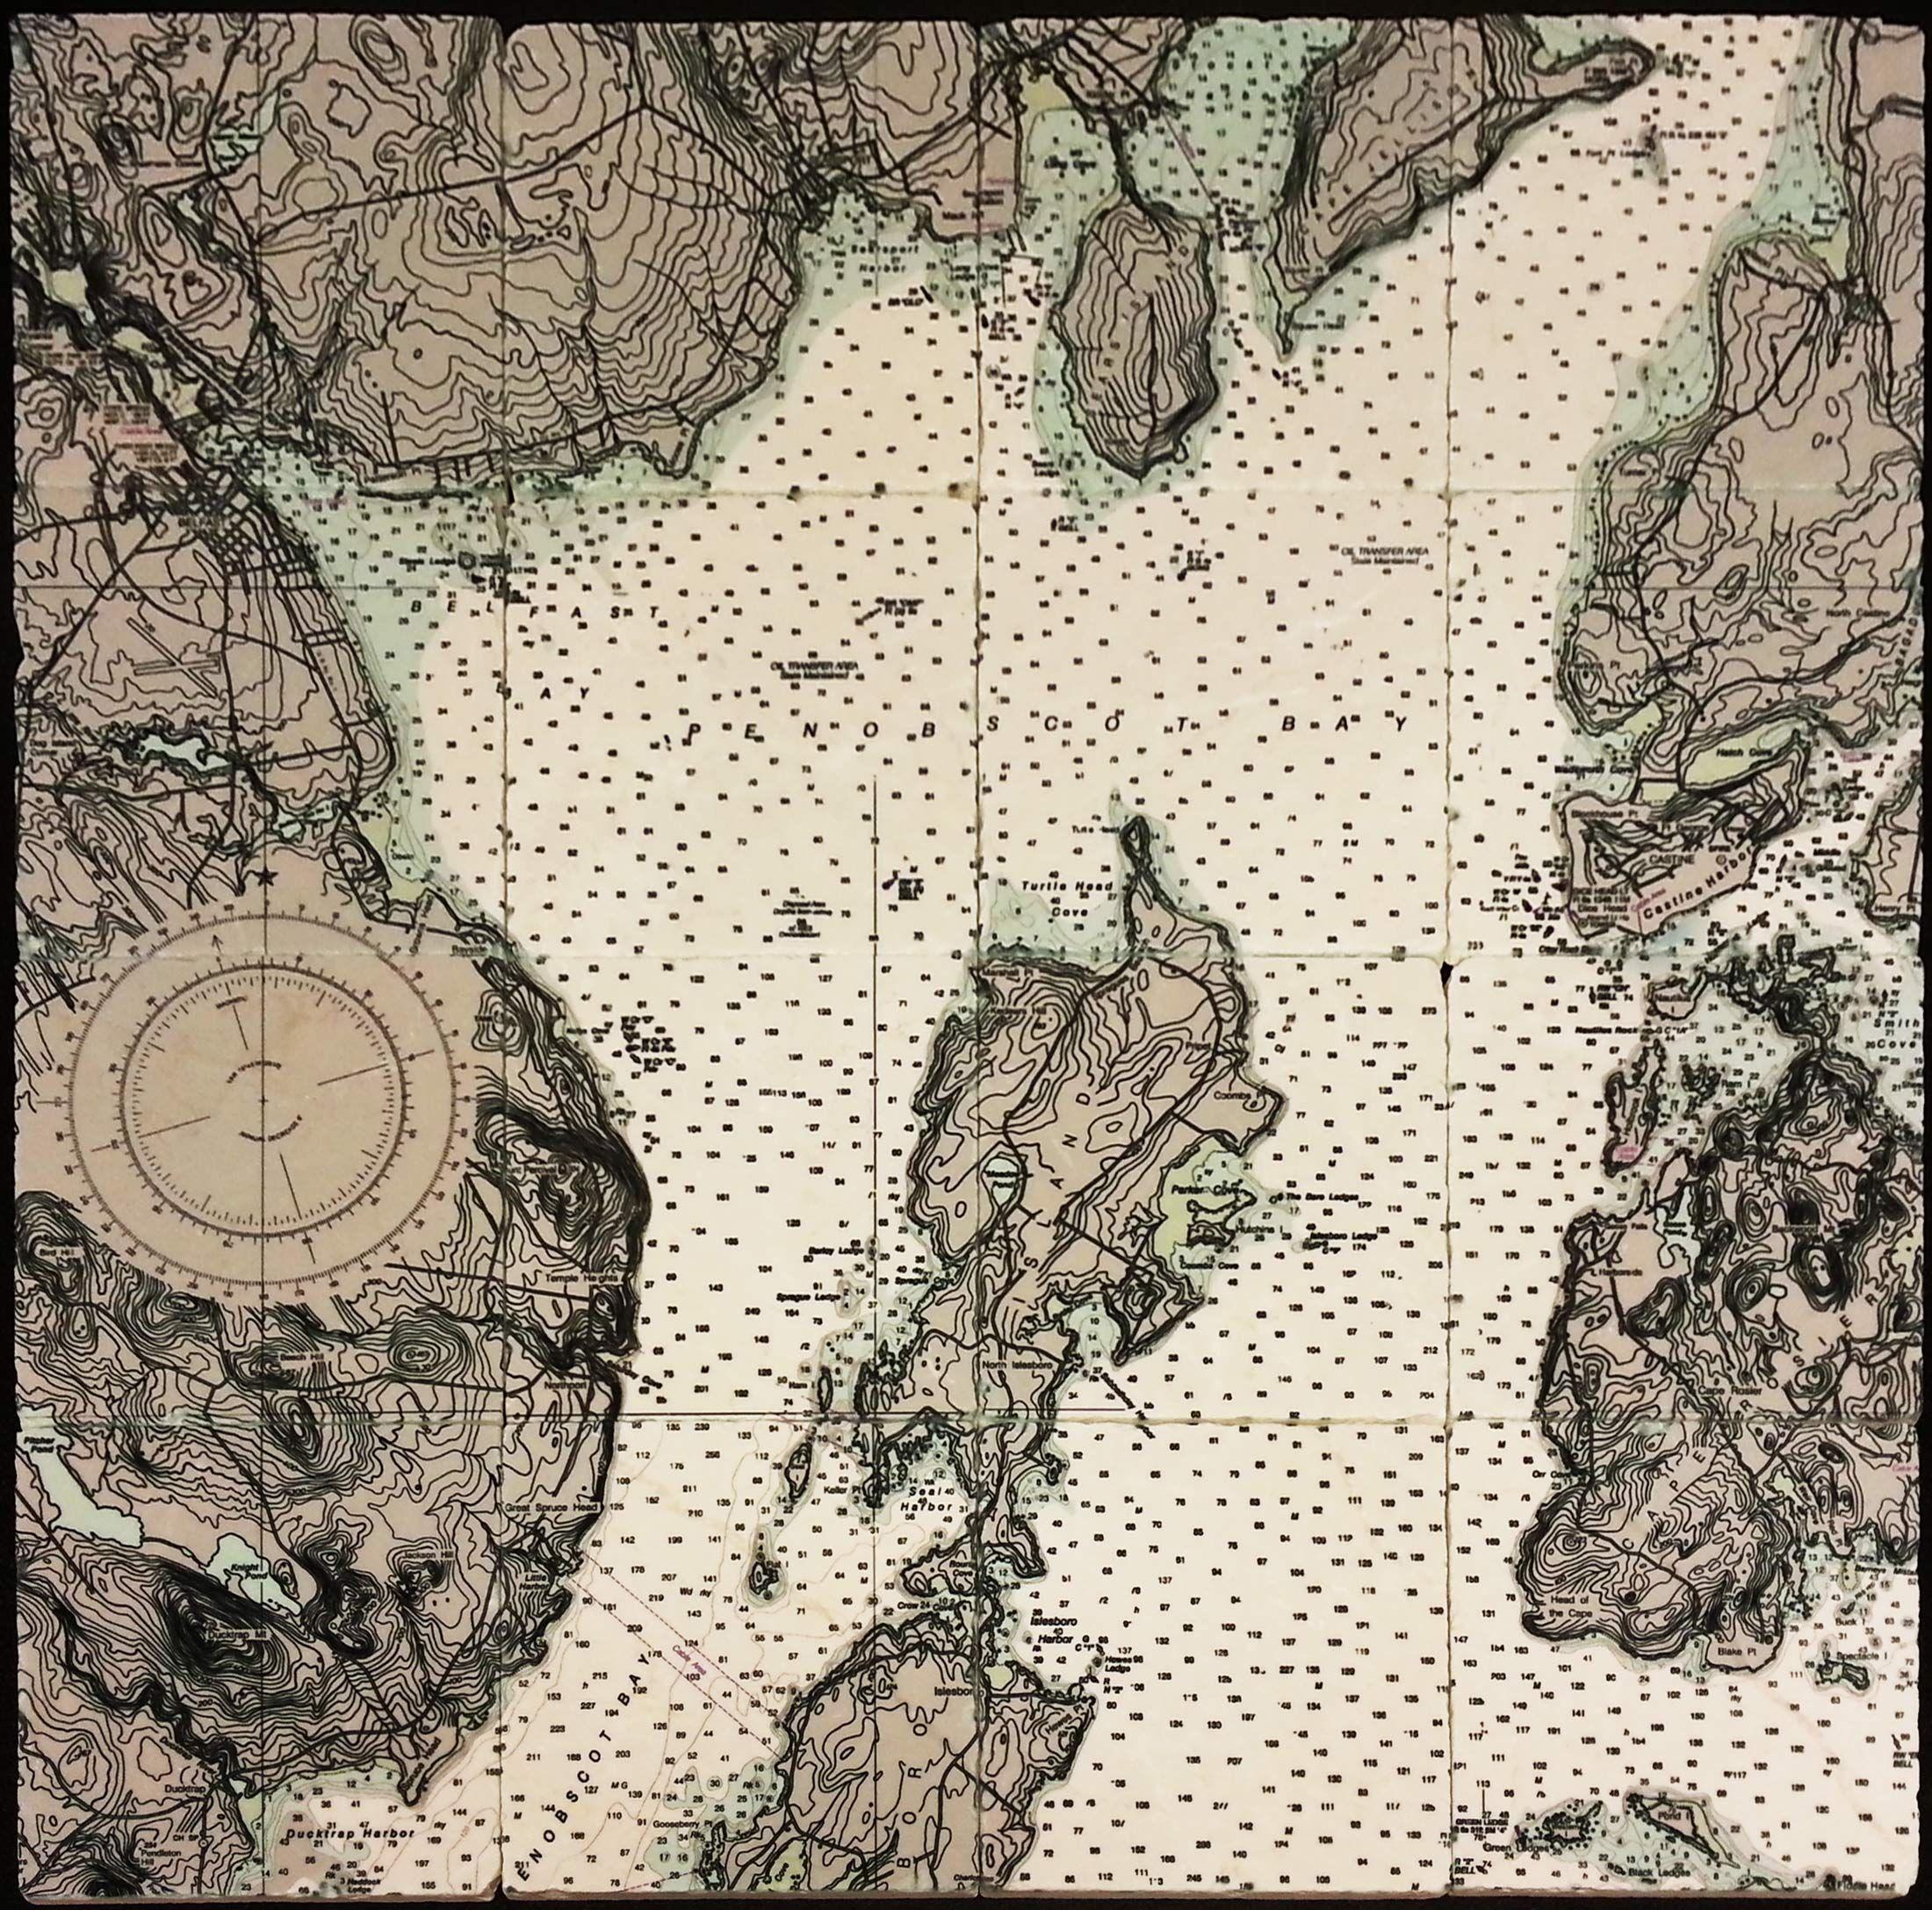 Nautical Map - coast of Maine, on Custom Printed Tumbled Marble ...